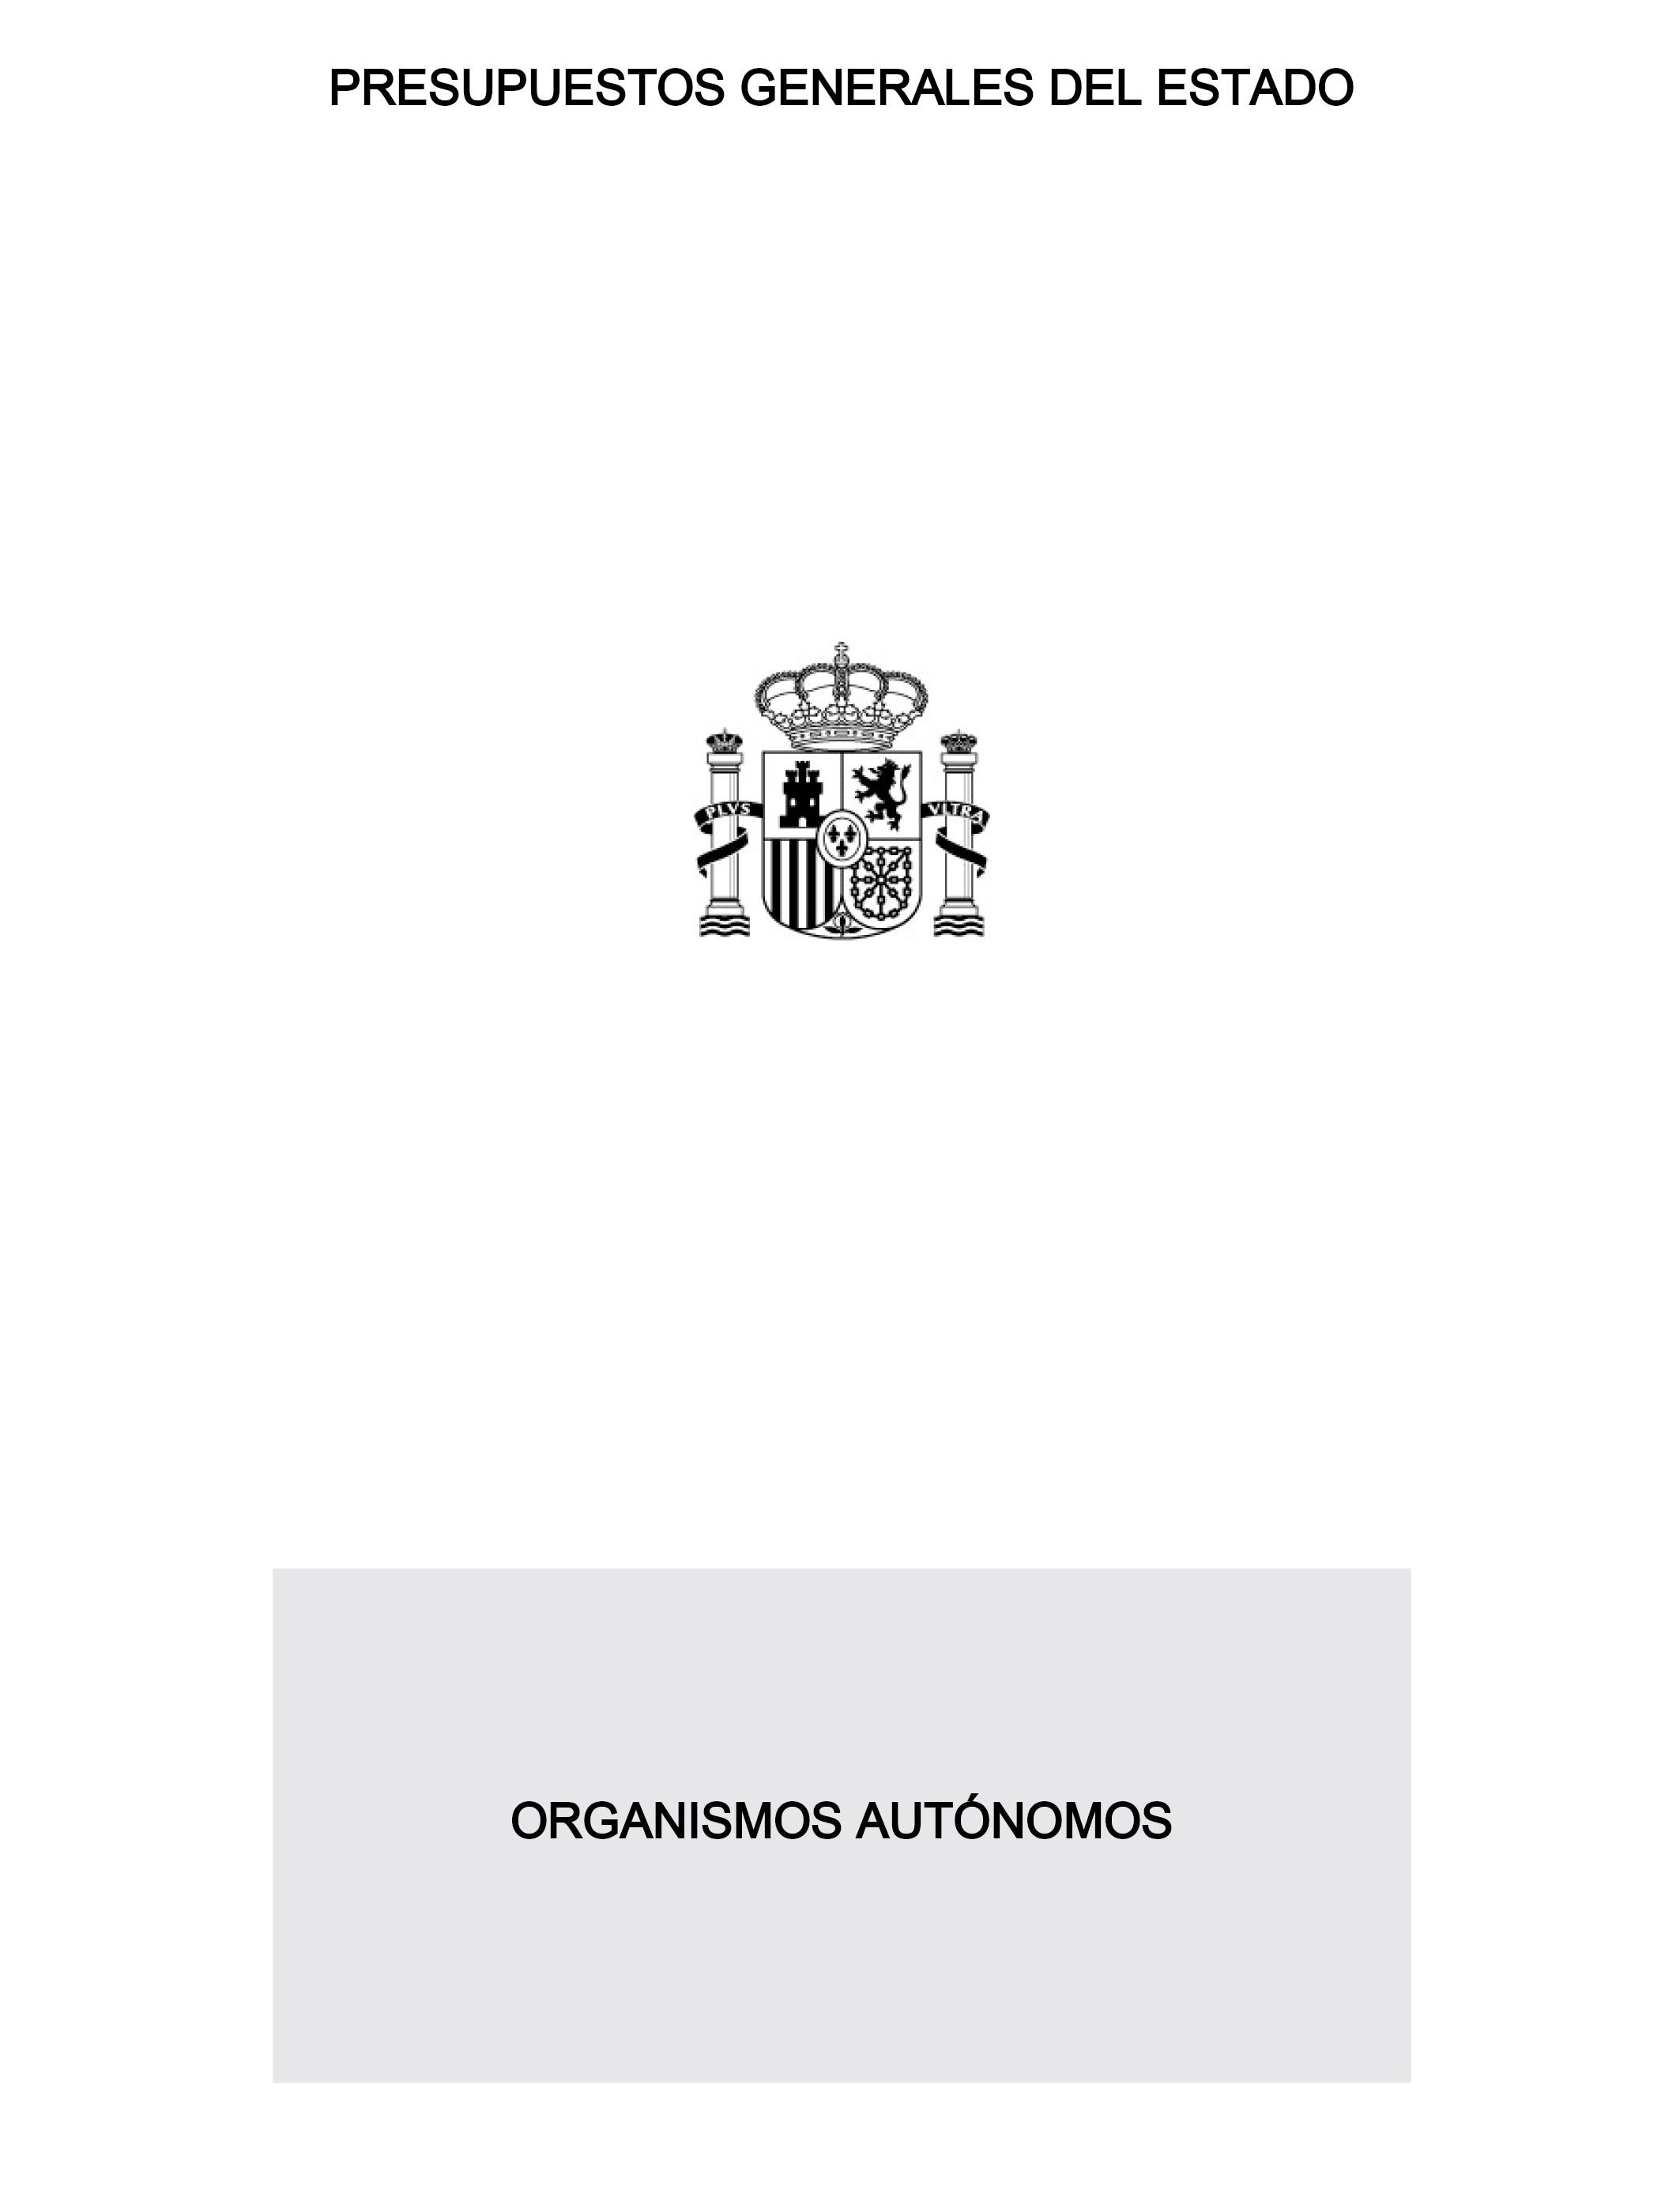 Calendario Fiestas 2019 andalucia Más Caliente Boe Documento Consolidado Boe A 2018 9268 Of Calendario Fiestas 2019 andalucia Más Reciente Ceip Manuel Canela